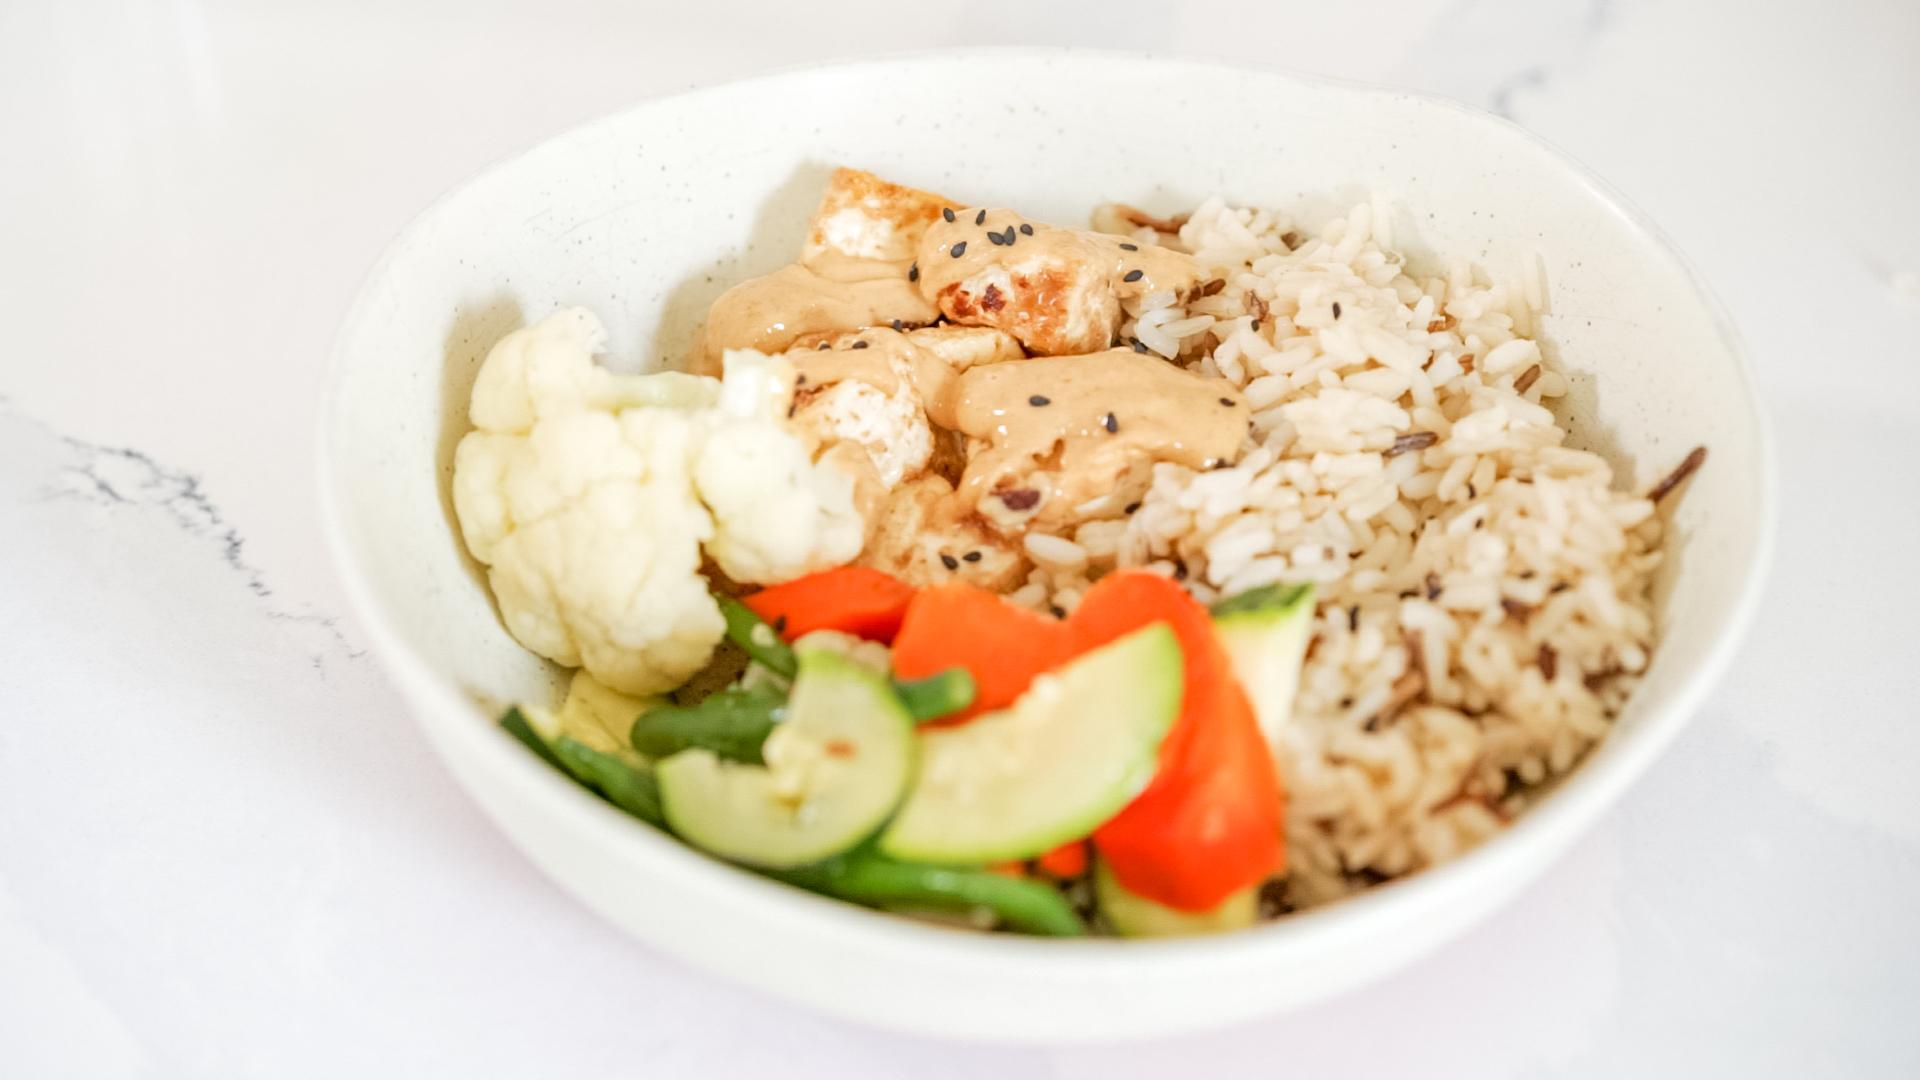 a bowl of tofu with peanut satay sauce, rice, cauliflower and salad